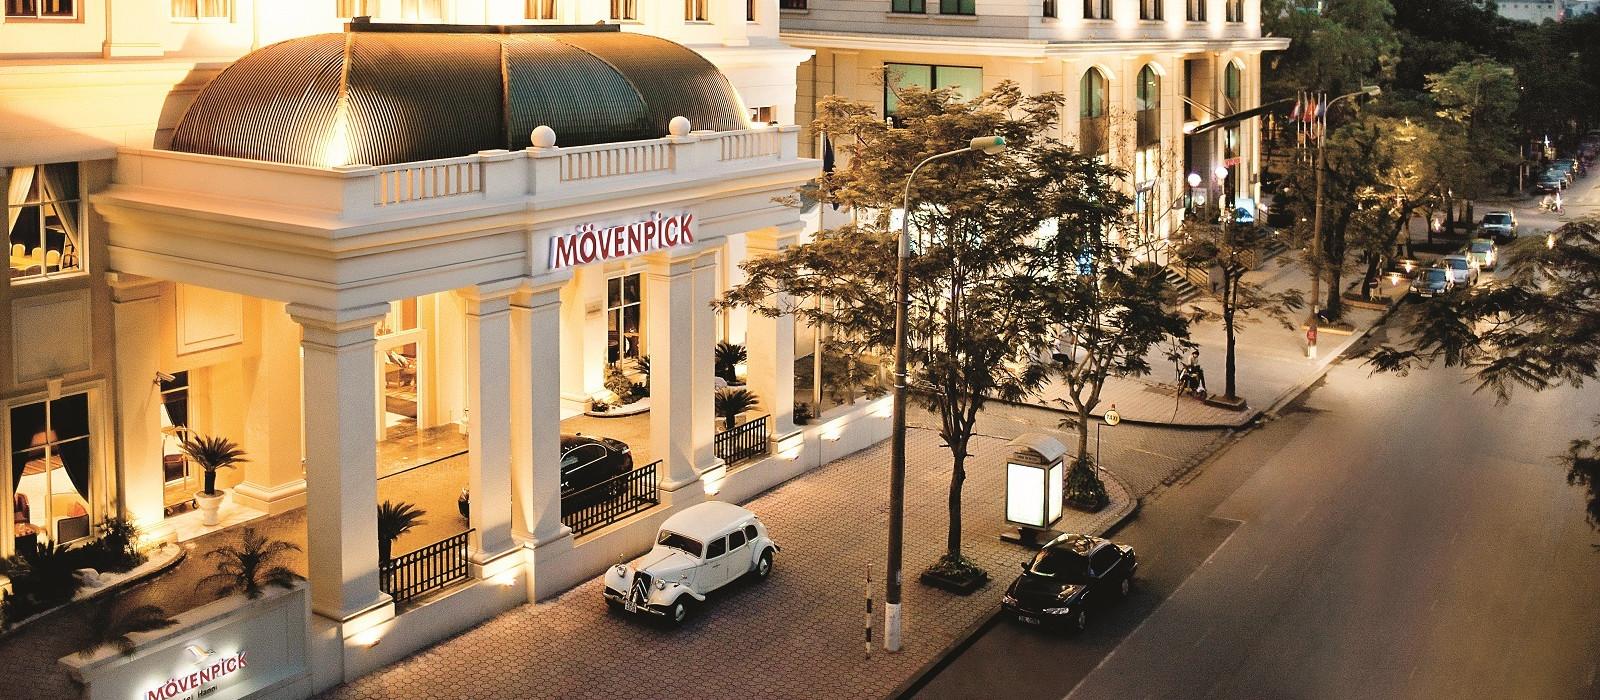 Hotel Movenpick  Vietnam